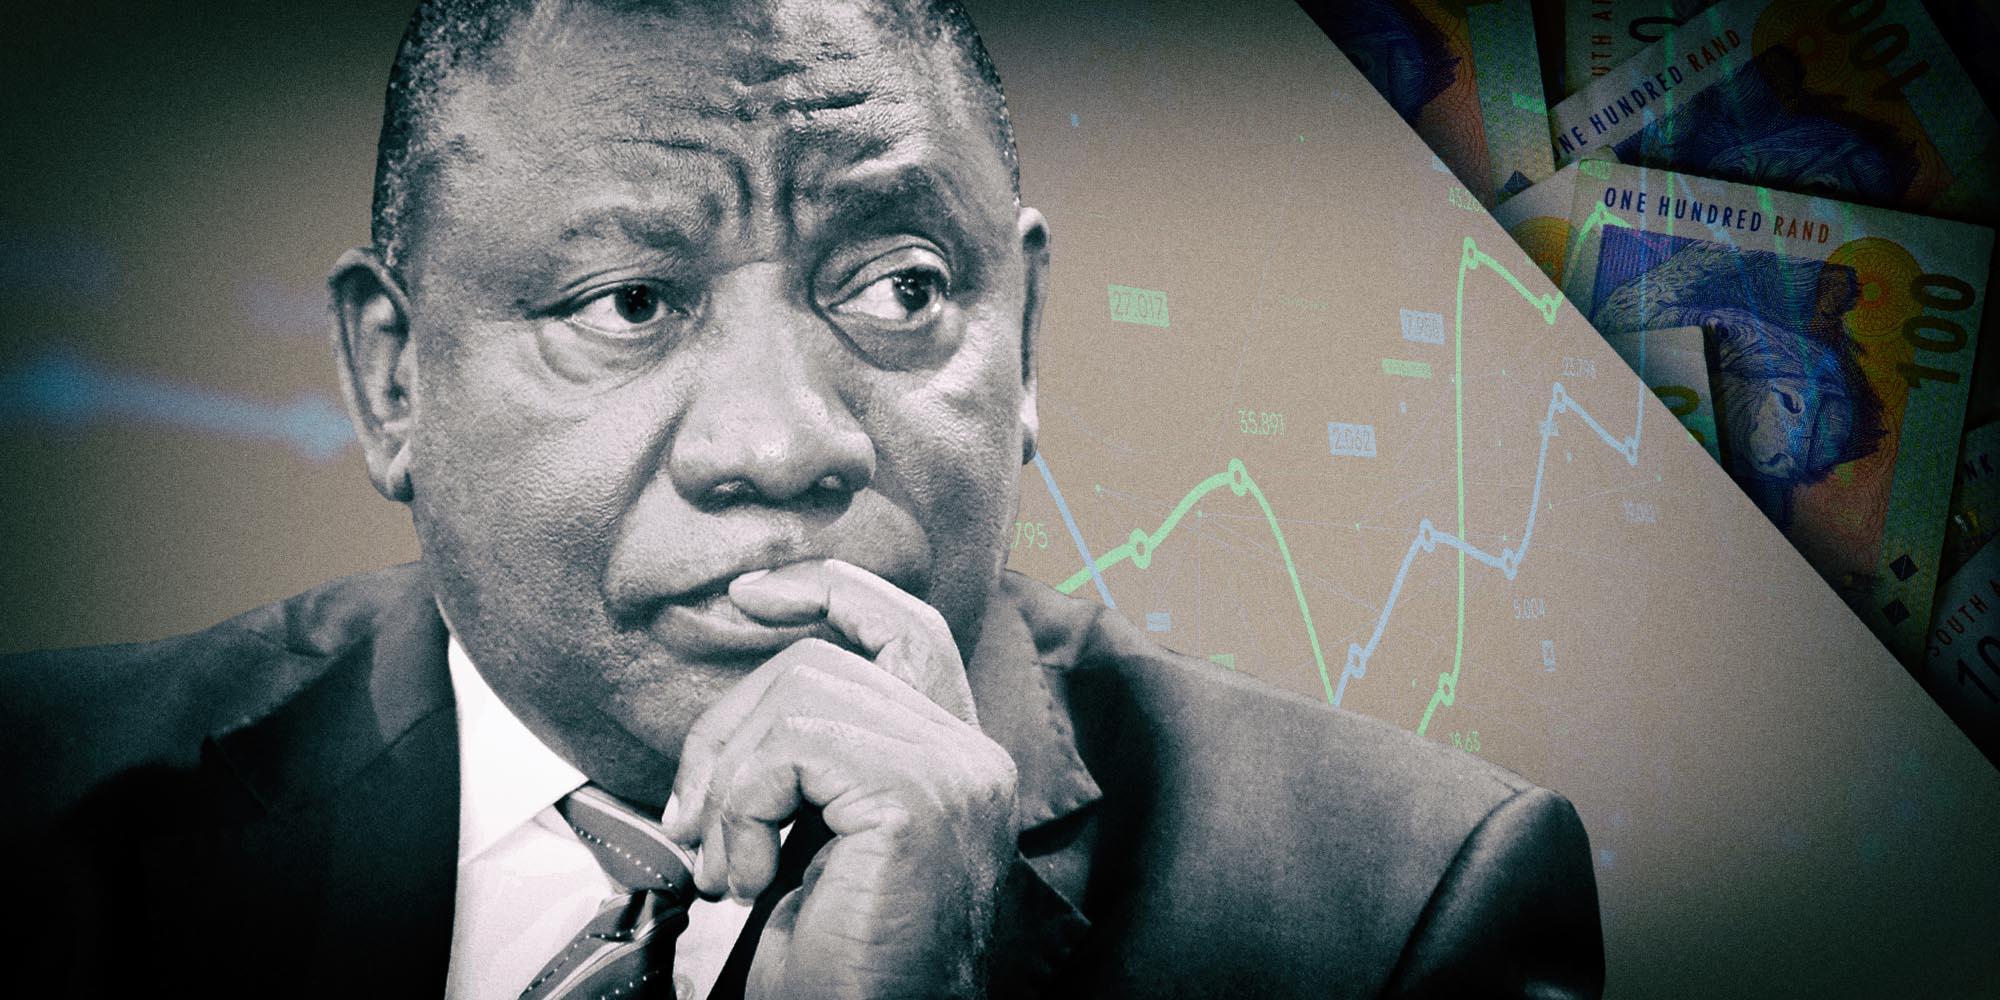 Op-Ed: The mathematics of corruption